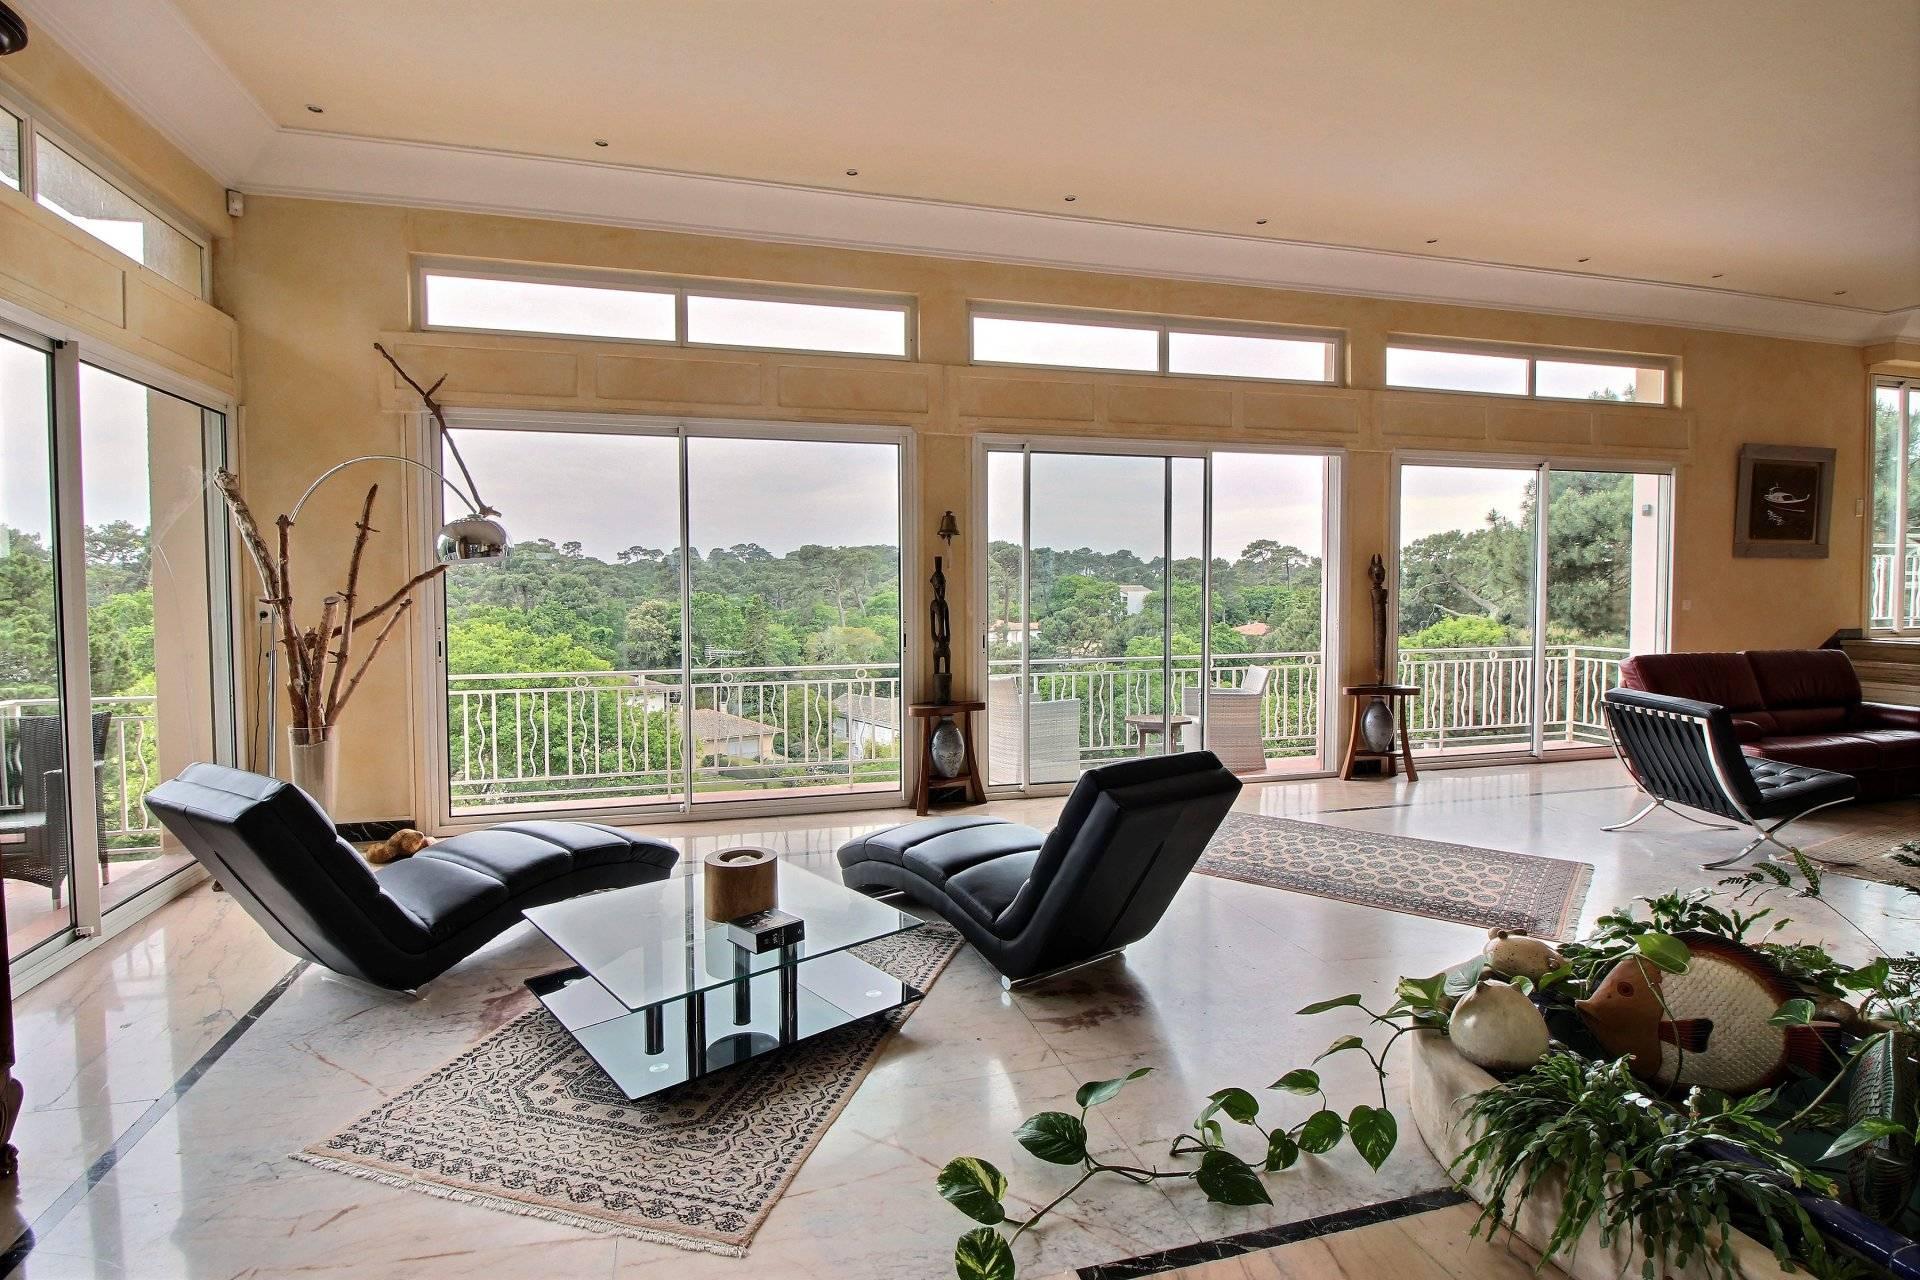 Vente villa de luxe avec vue panoramique quartier Pereire ARCACHON